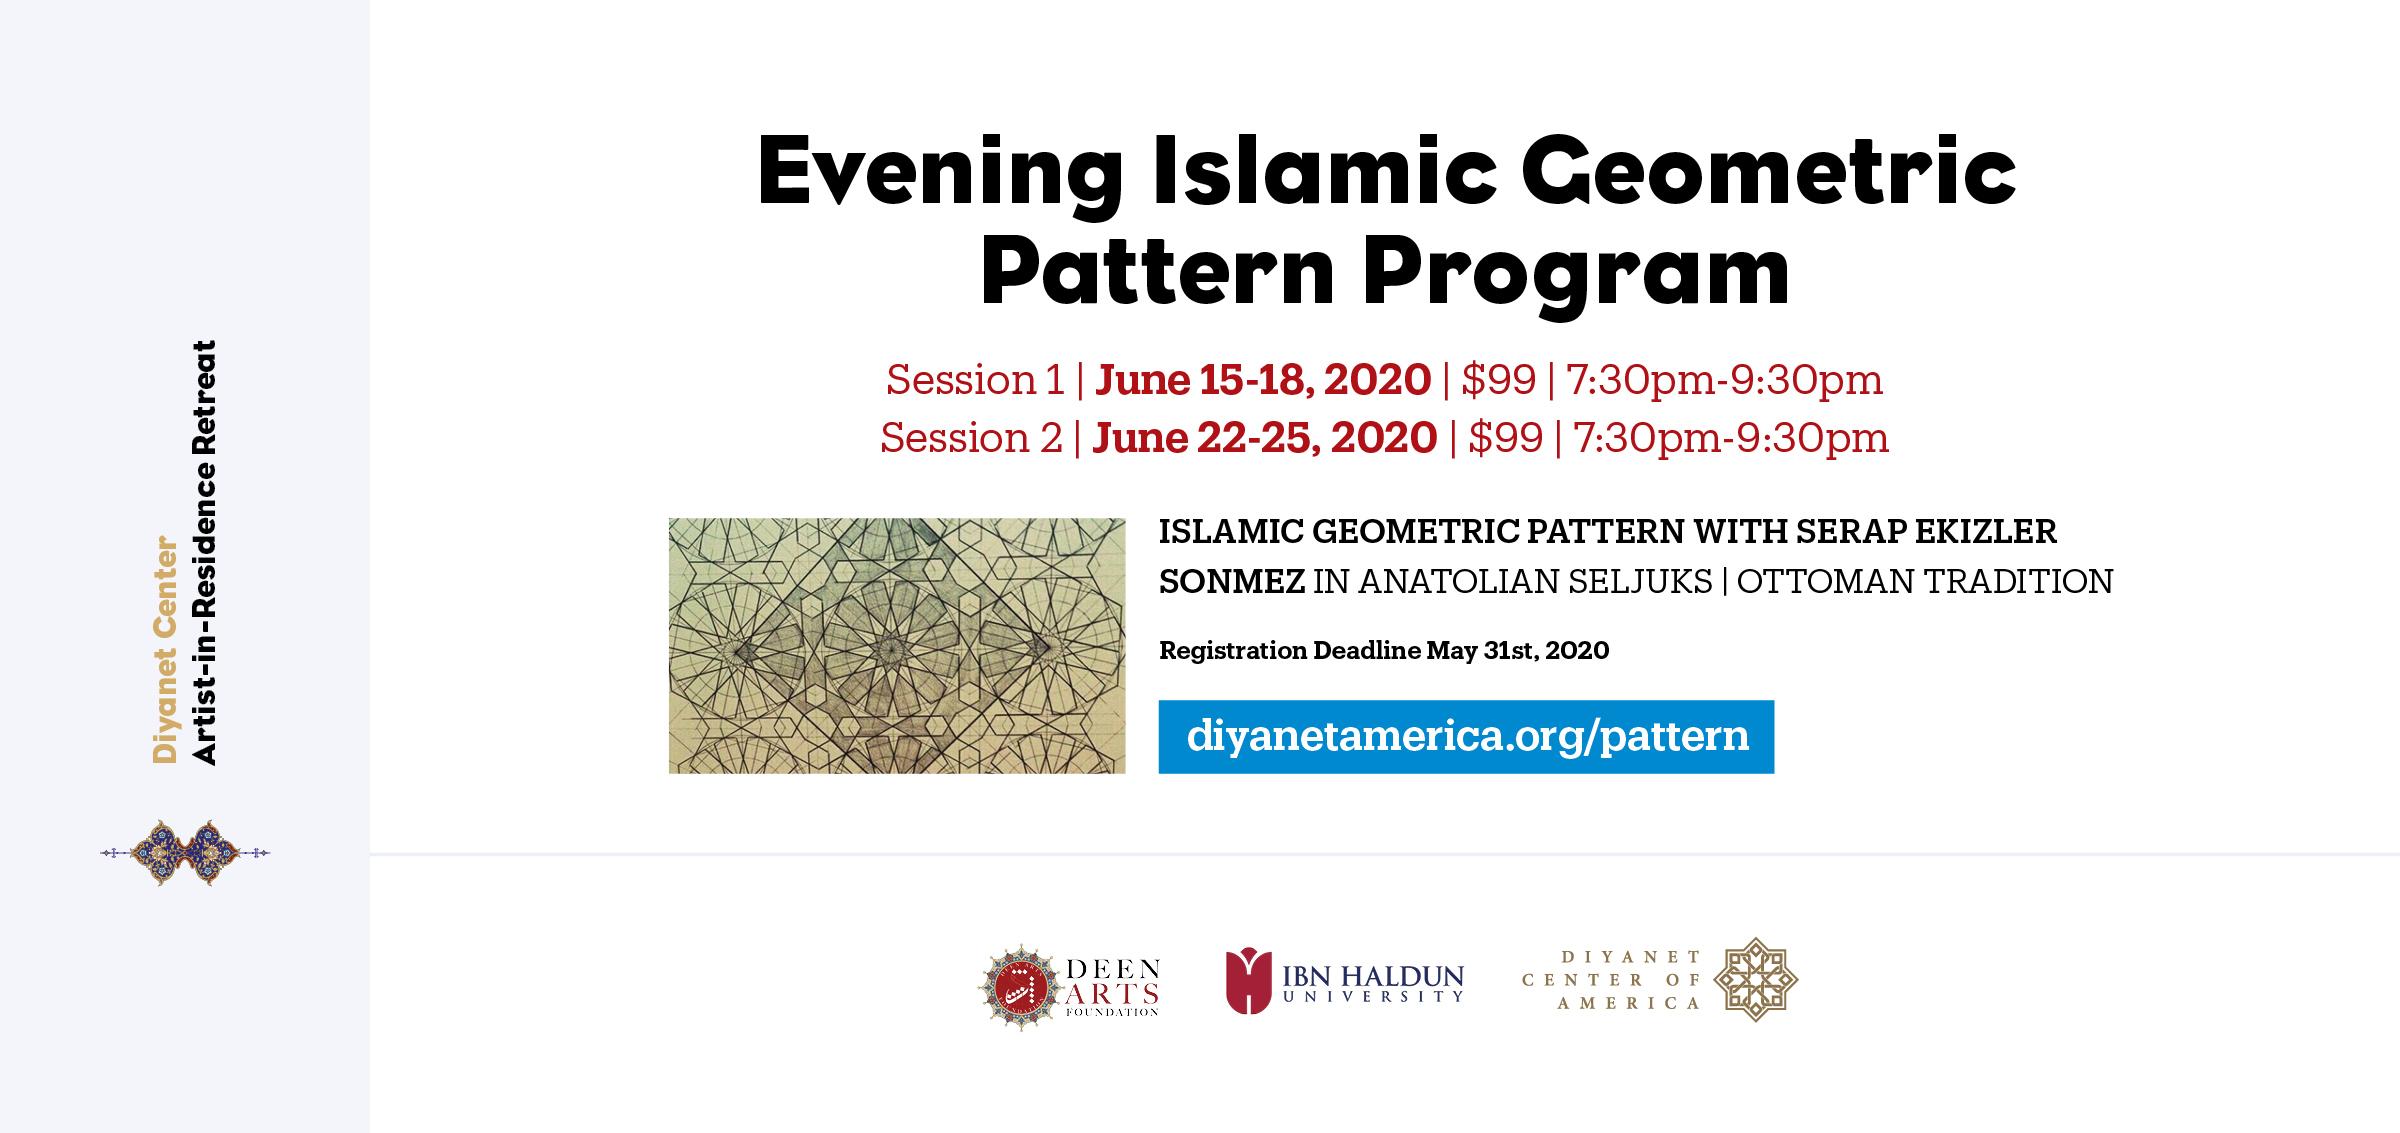 Islamic Geometric Pattern Evening Program - Artist-in-Residence Retreat